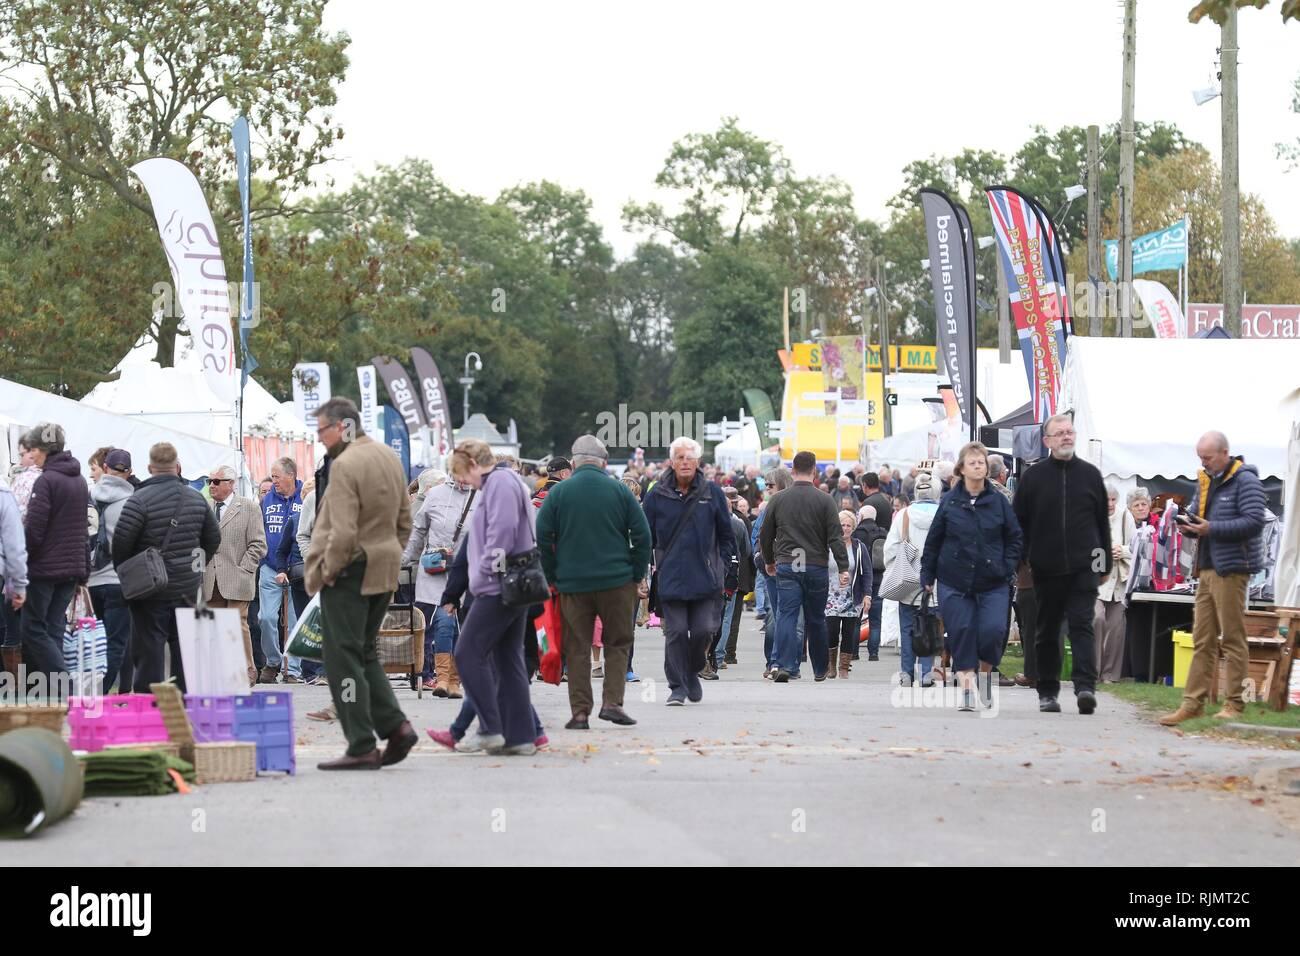 Malvern Autumn Show at The Three Counties Showground - Stock Image